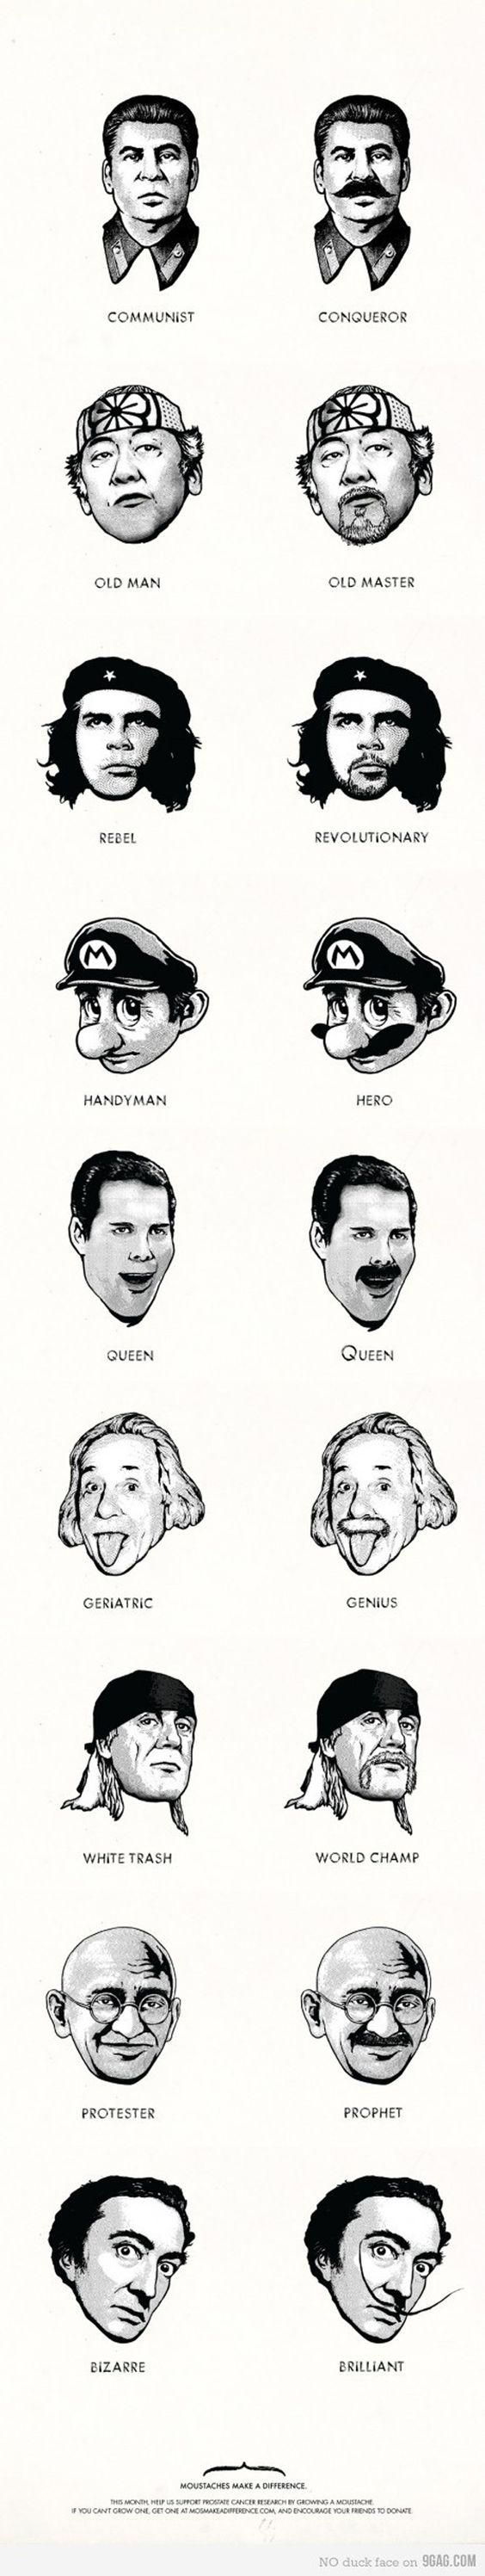 mustache makes the man